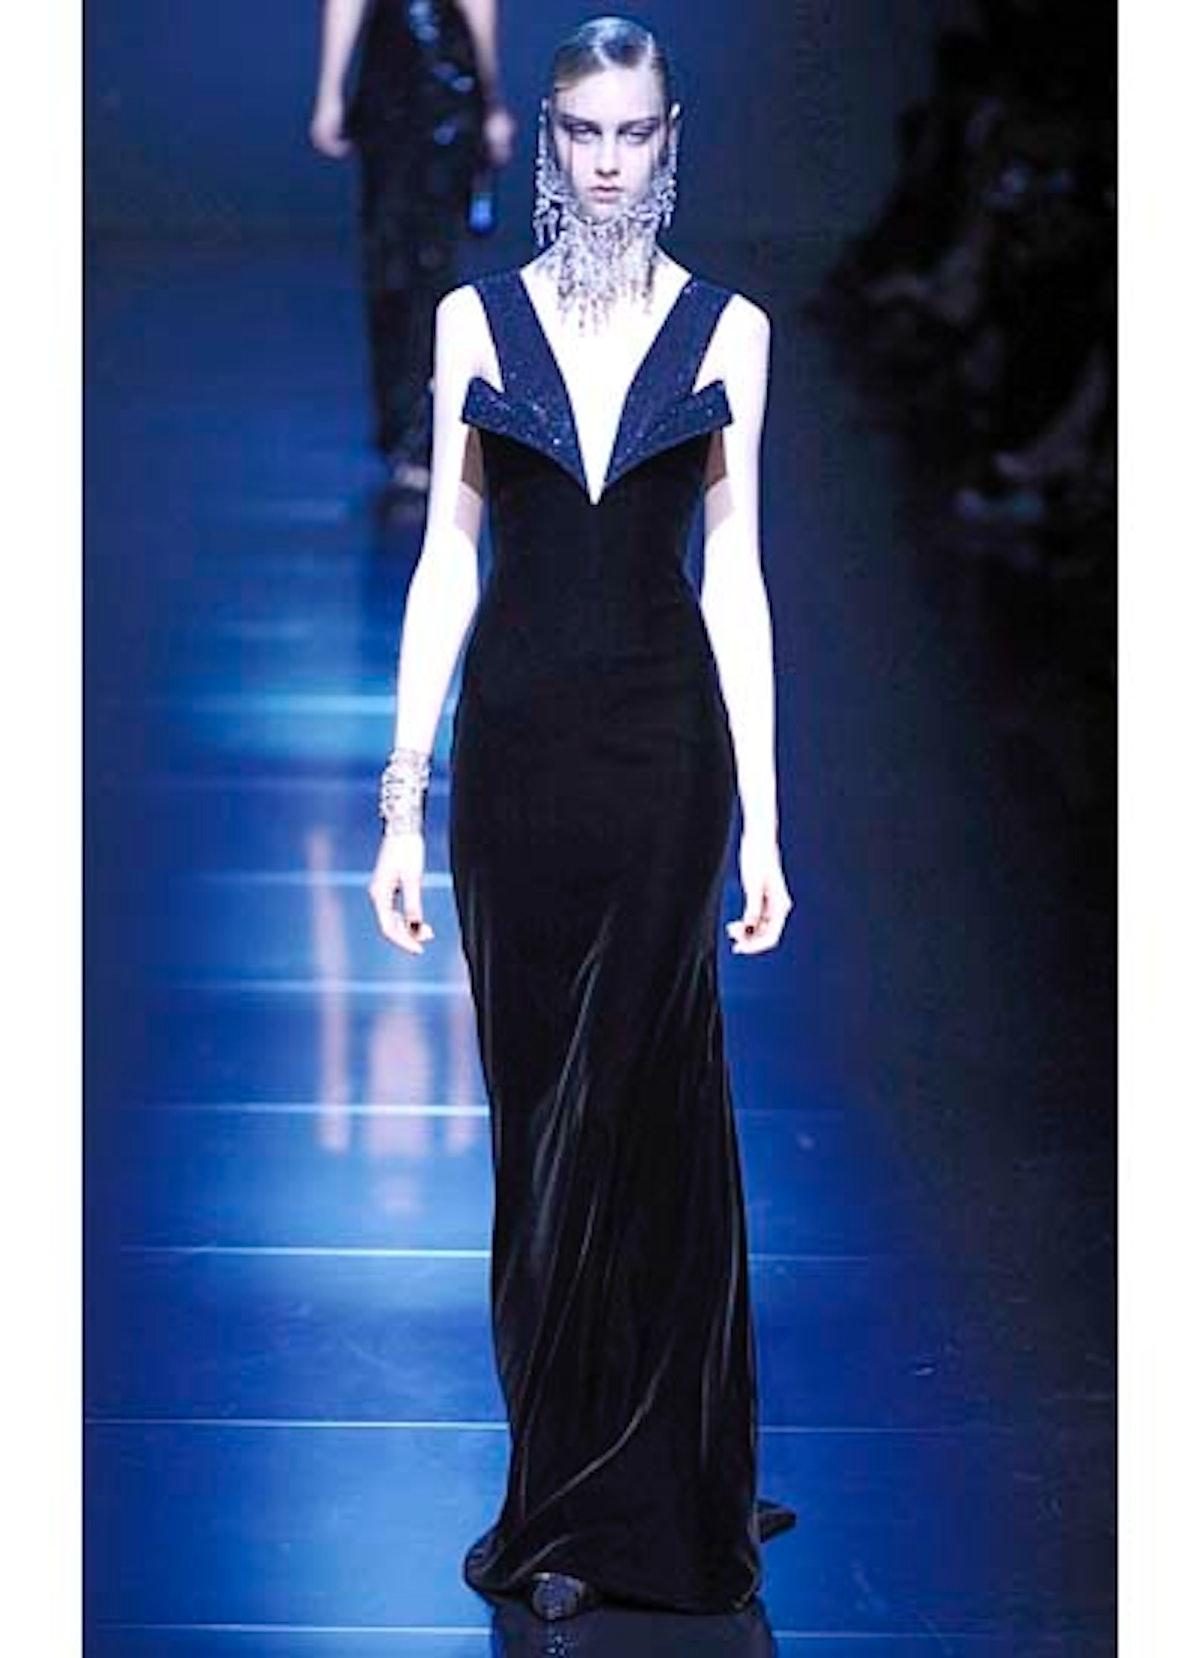 fass-giorgio-armani-couture-2012-runway-47-v.jpg